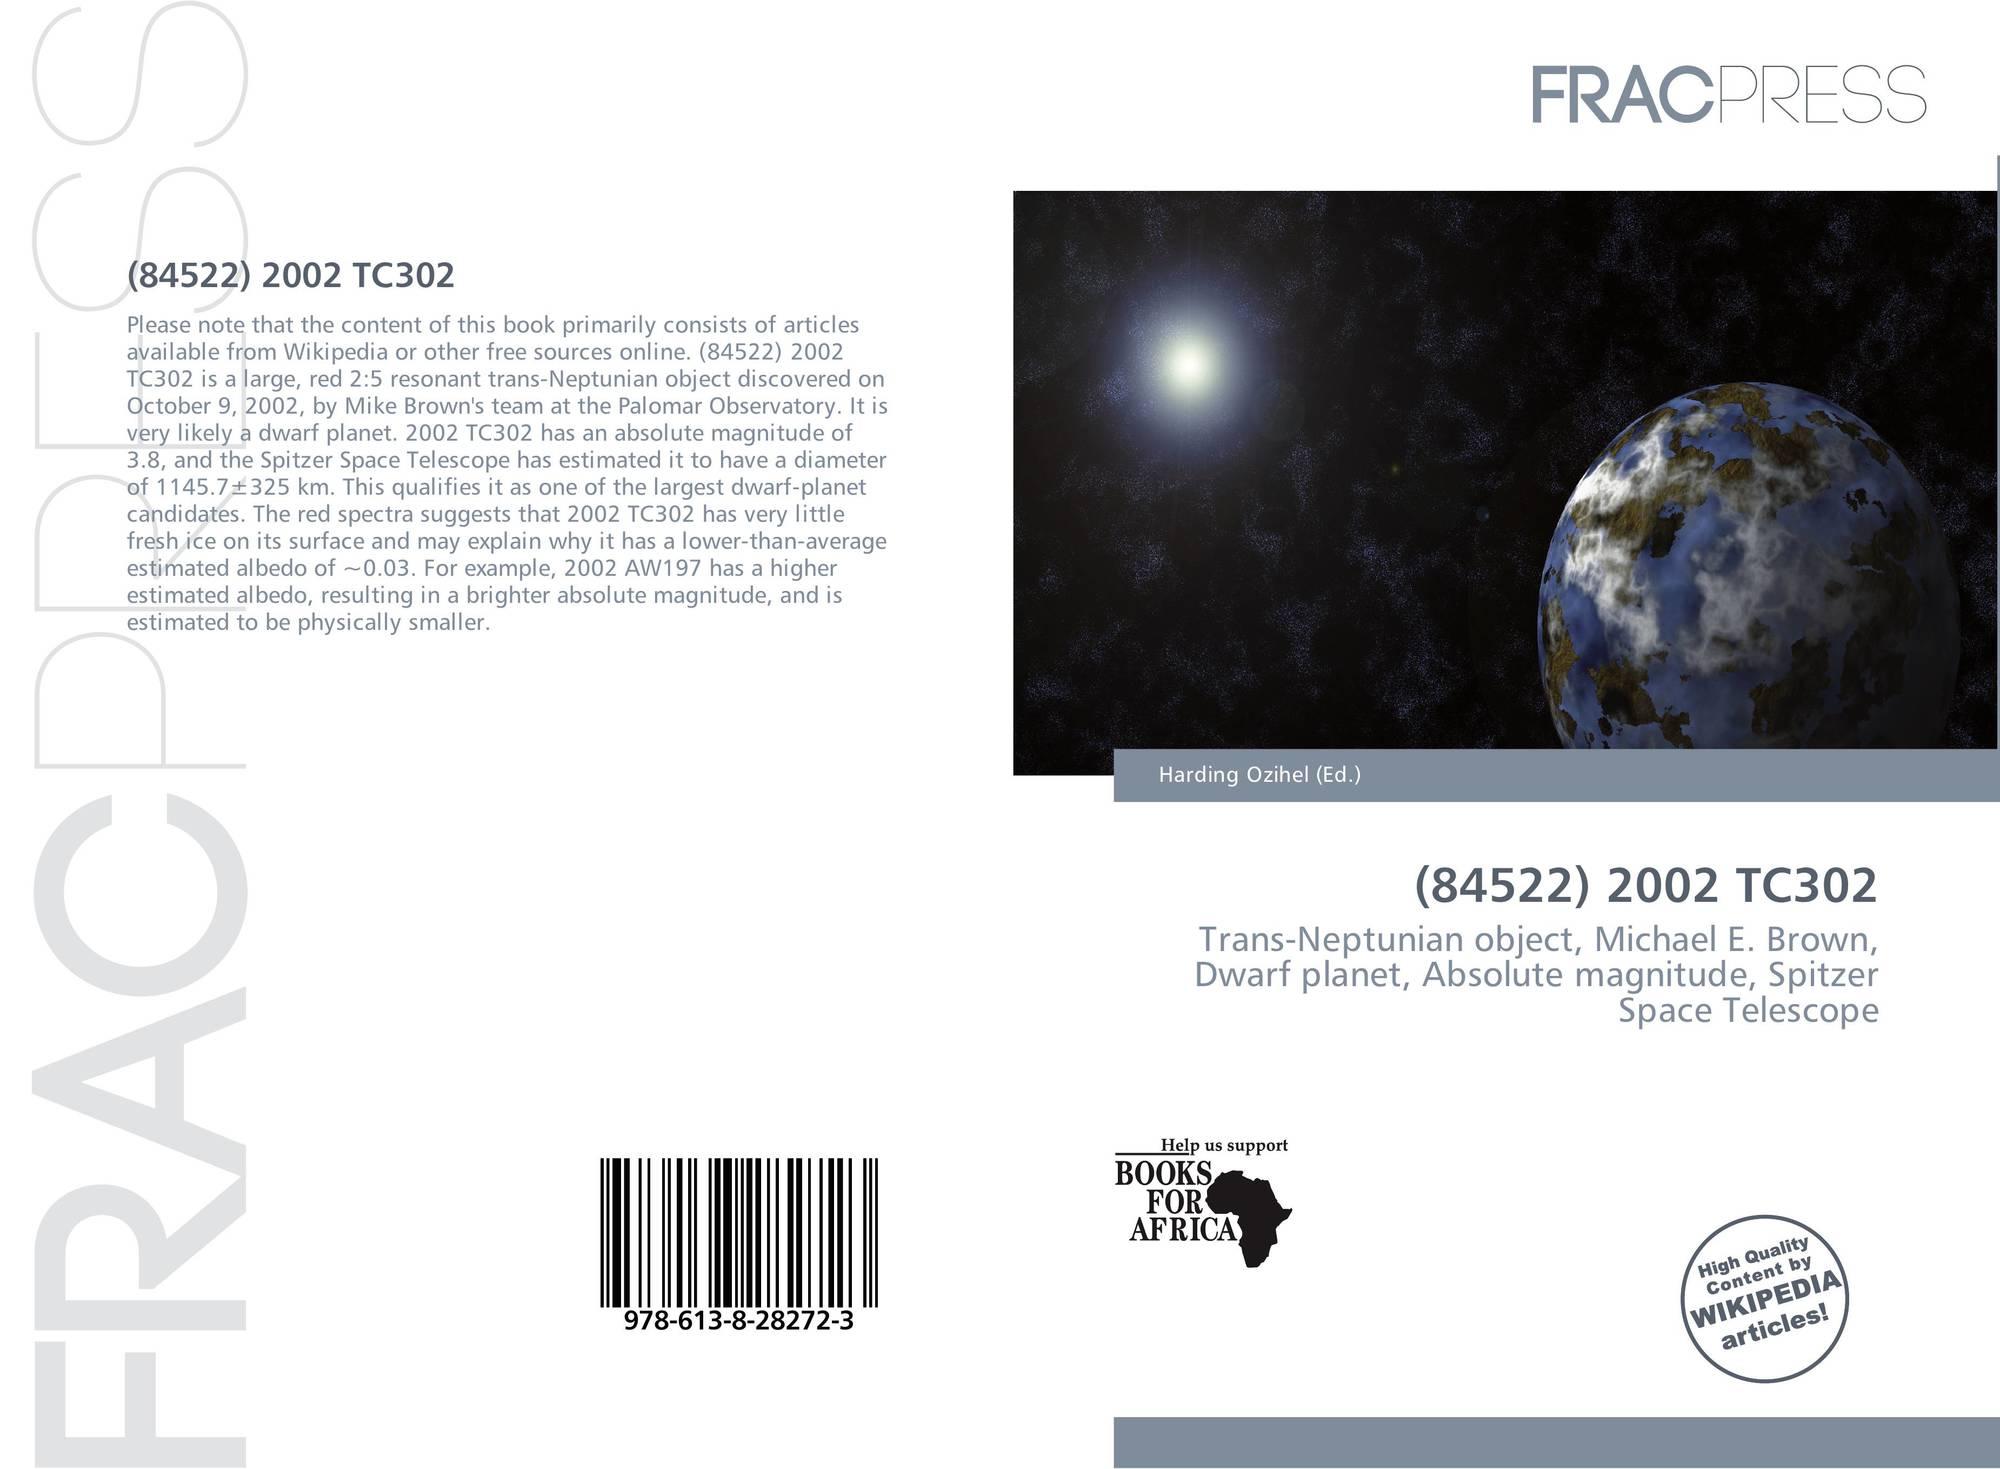 84522) 2002 TC302, 978-613-8-28272-3, 6138282728 ,9786138282723